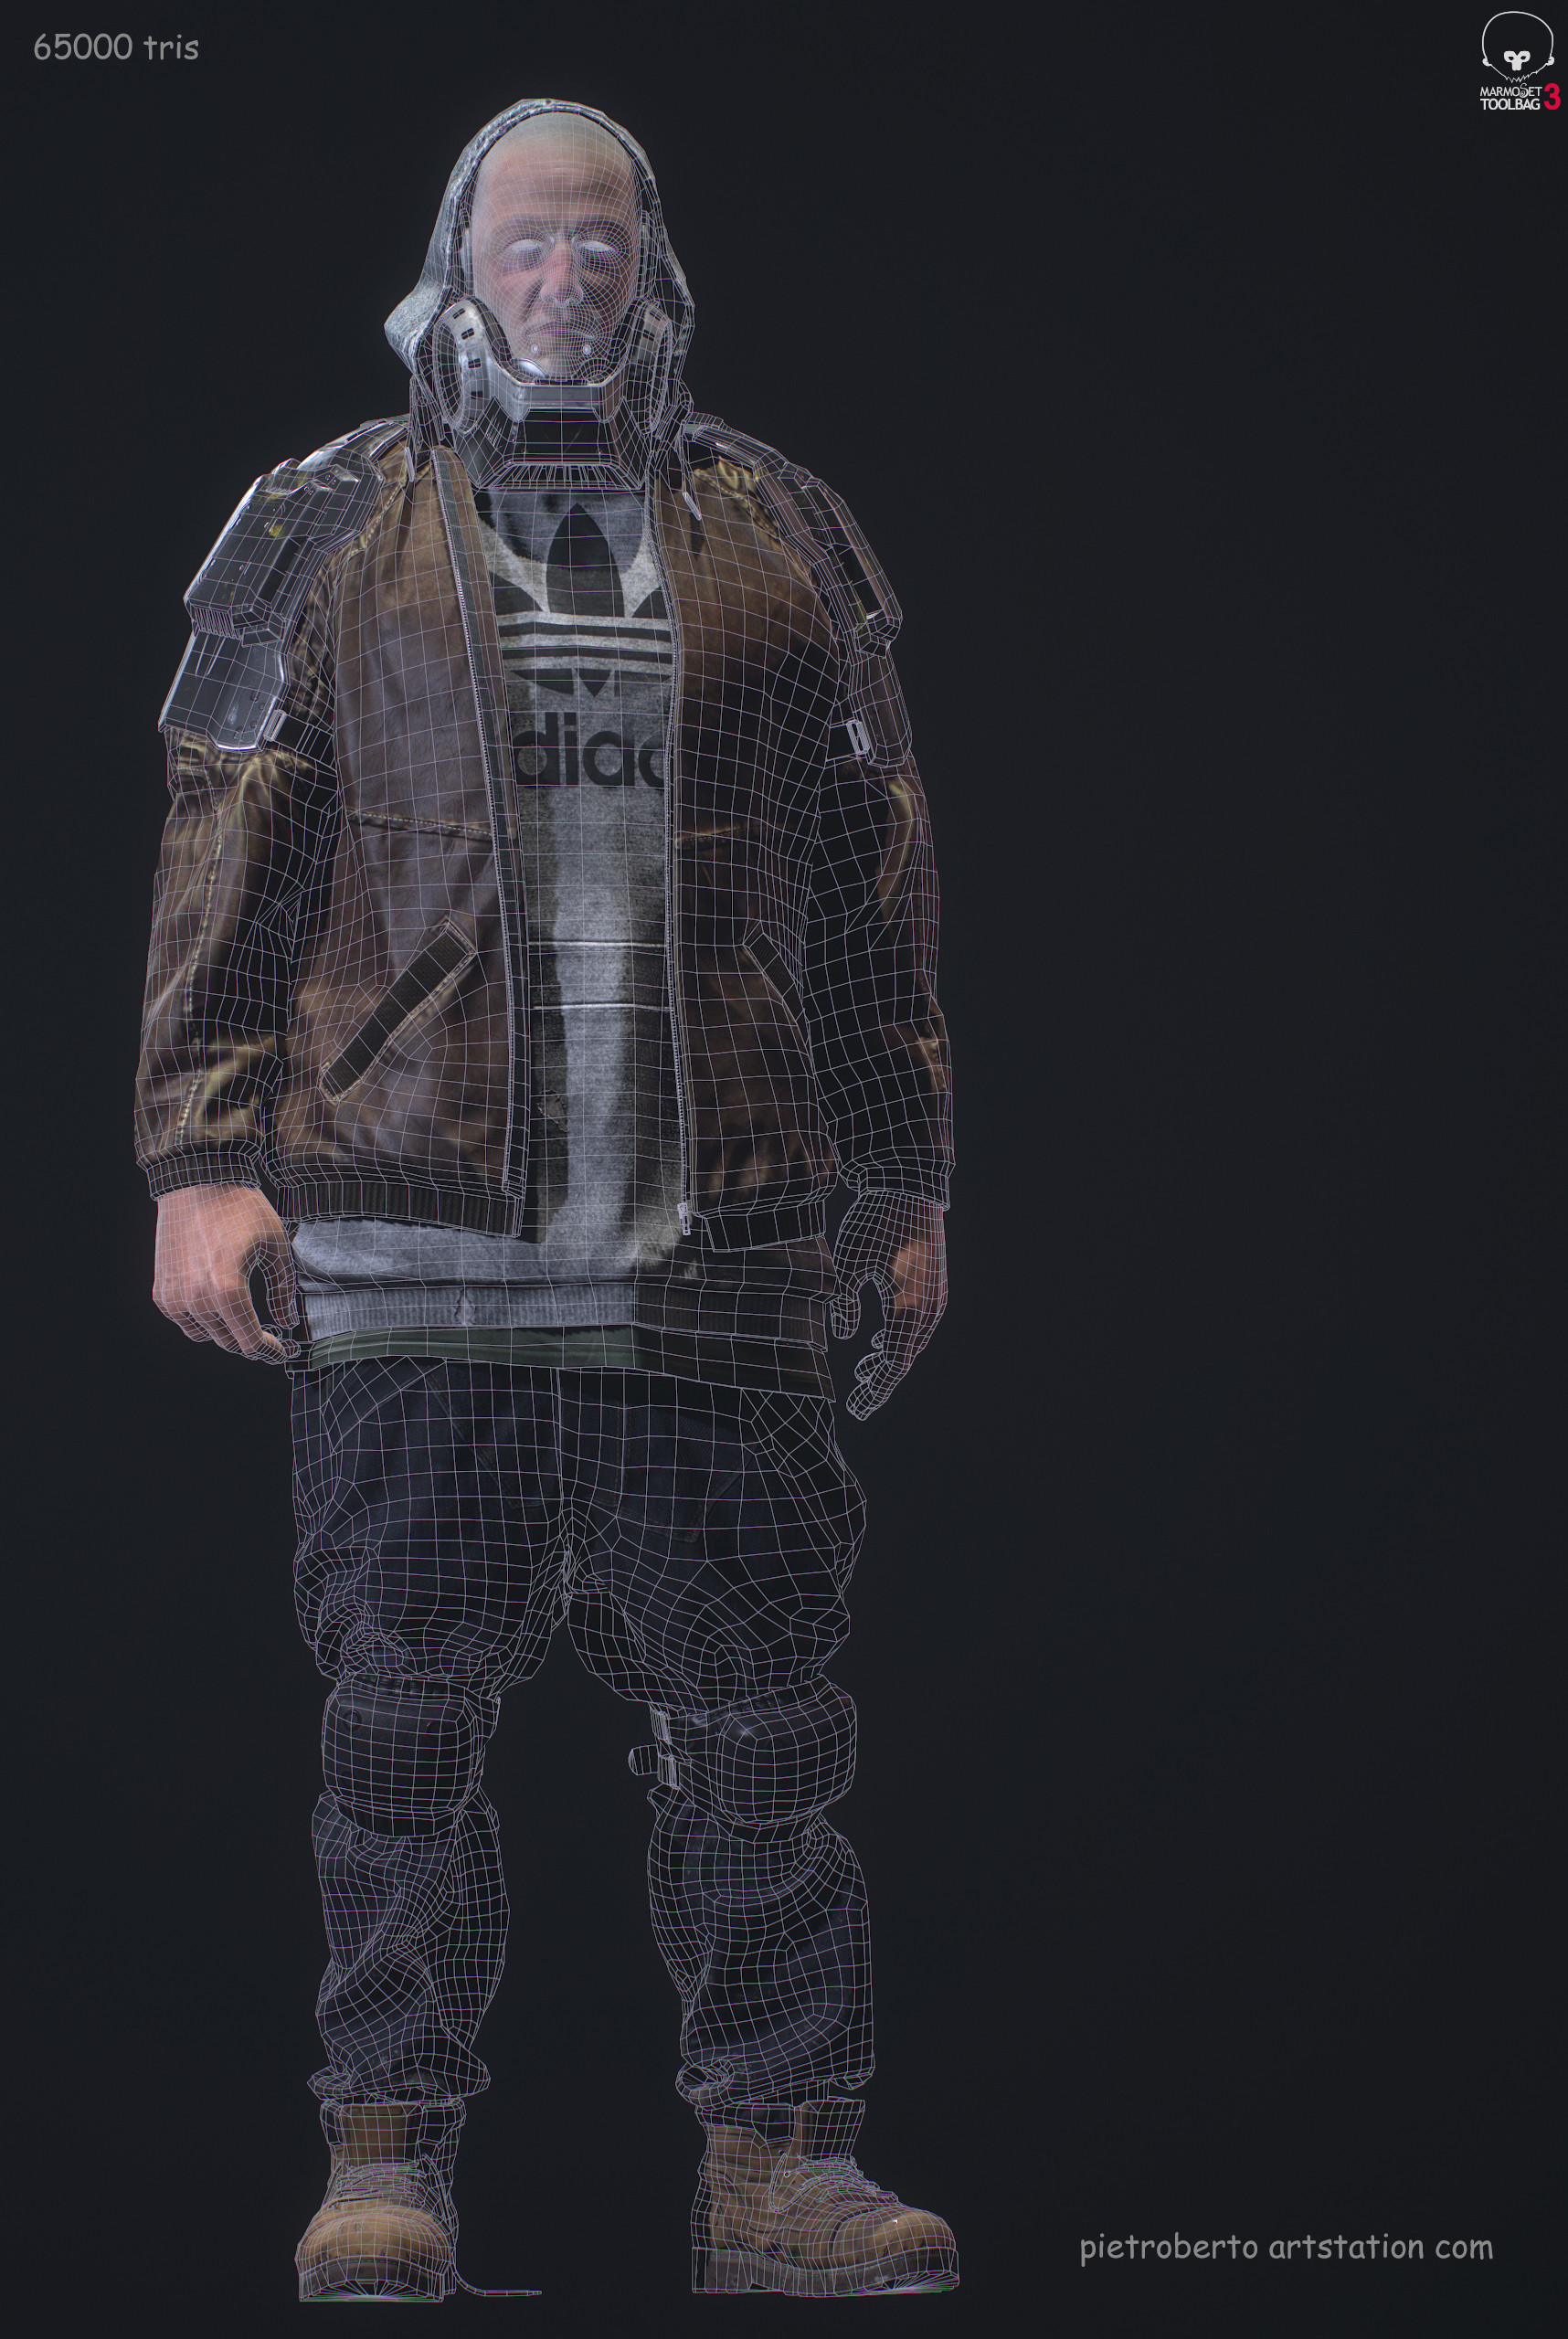 Pietro berto wire